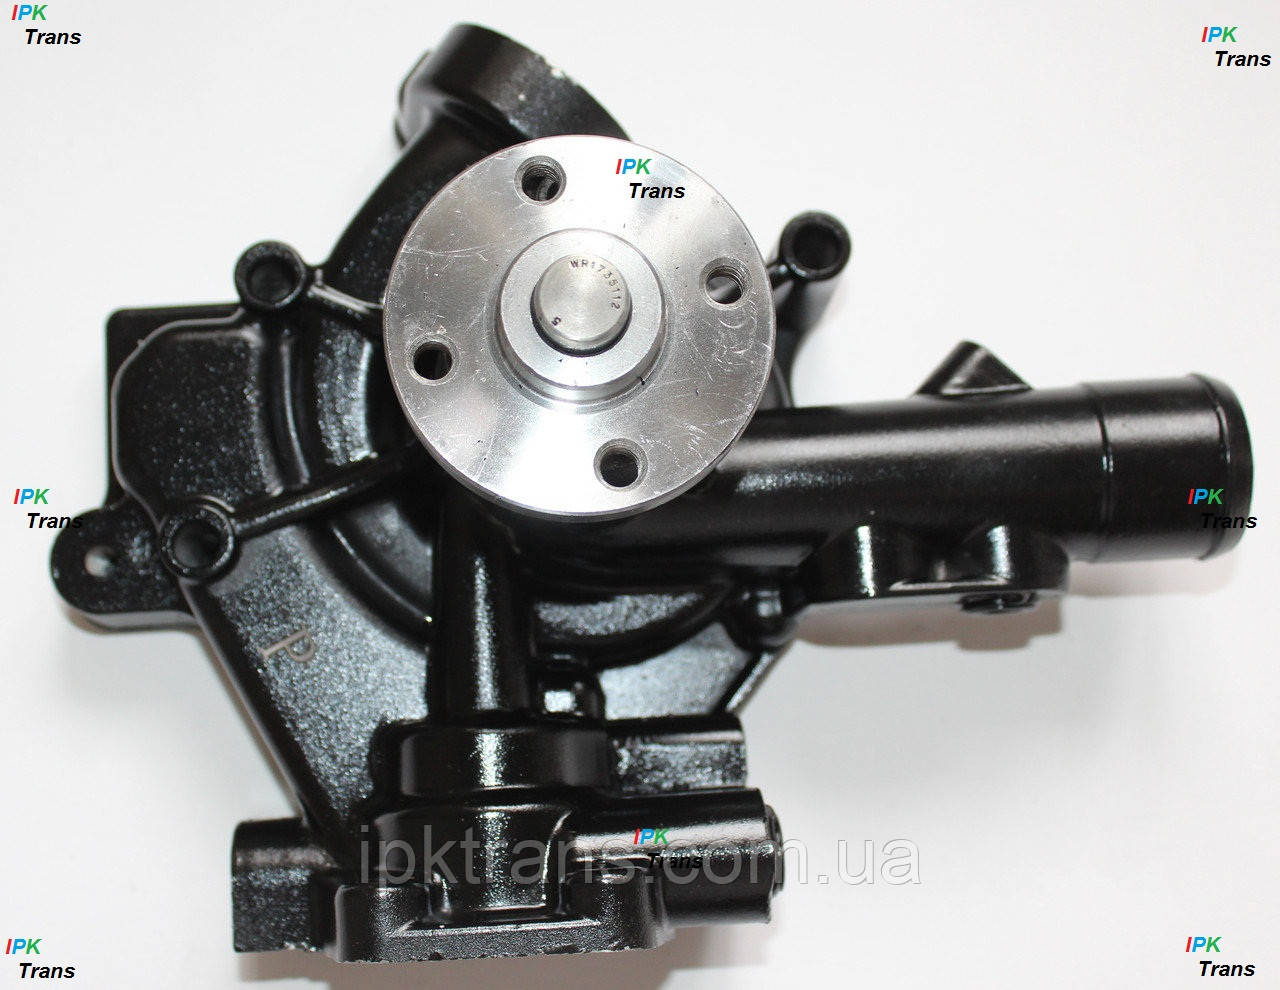 Насос водяной двигателя YANMAR 4TNE94 (2145 грн) YM12990042053 / 12990-042053